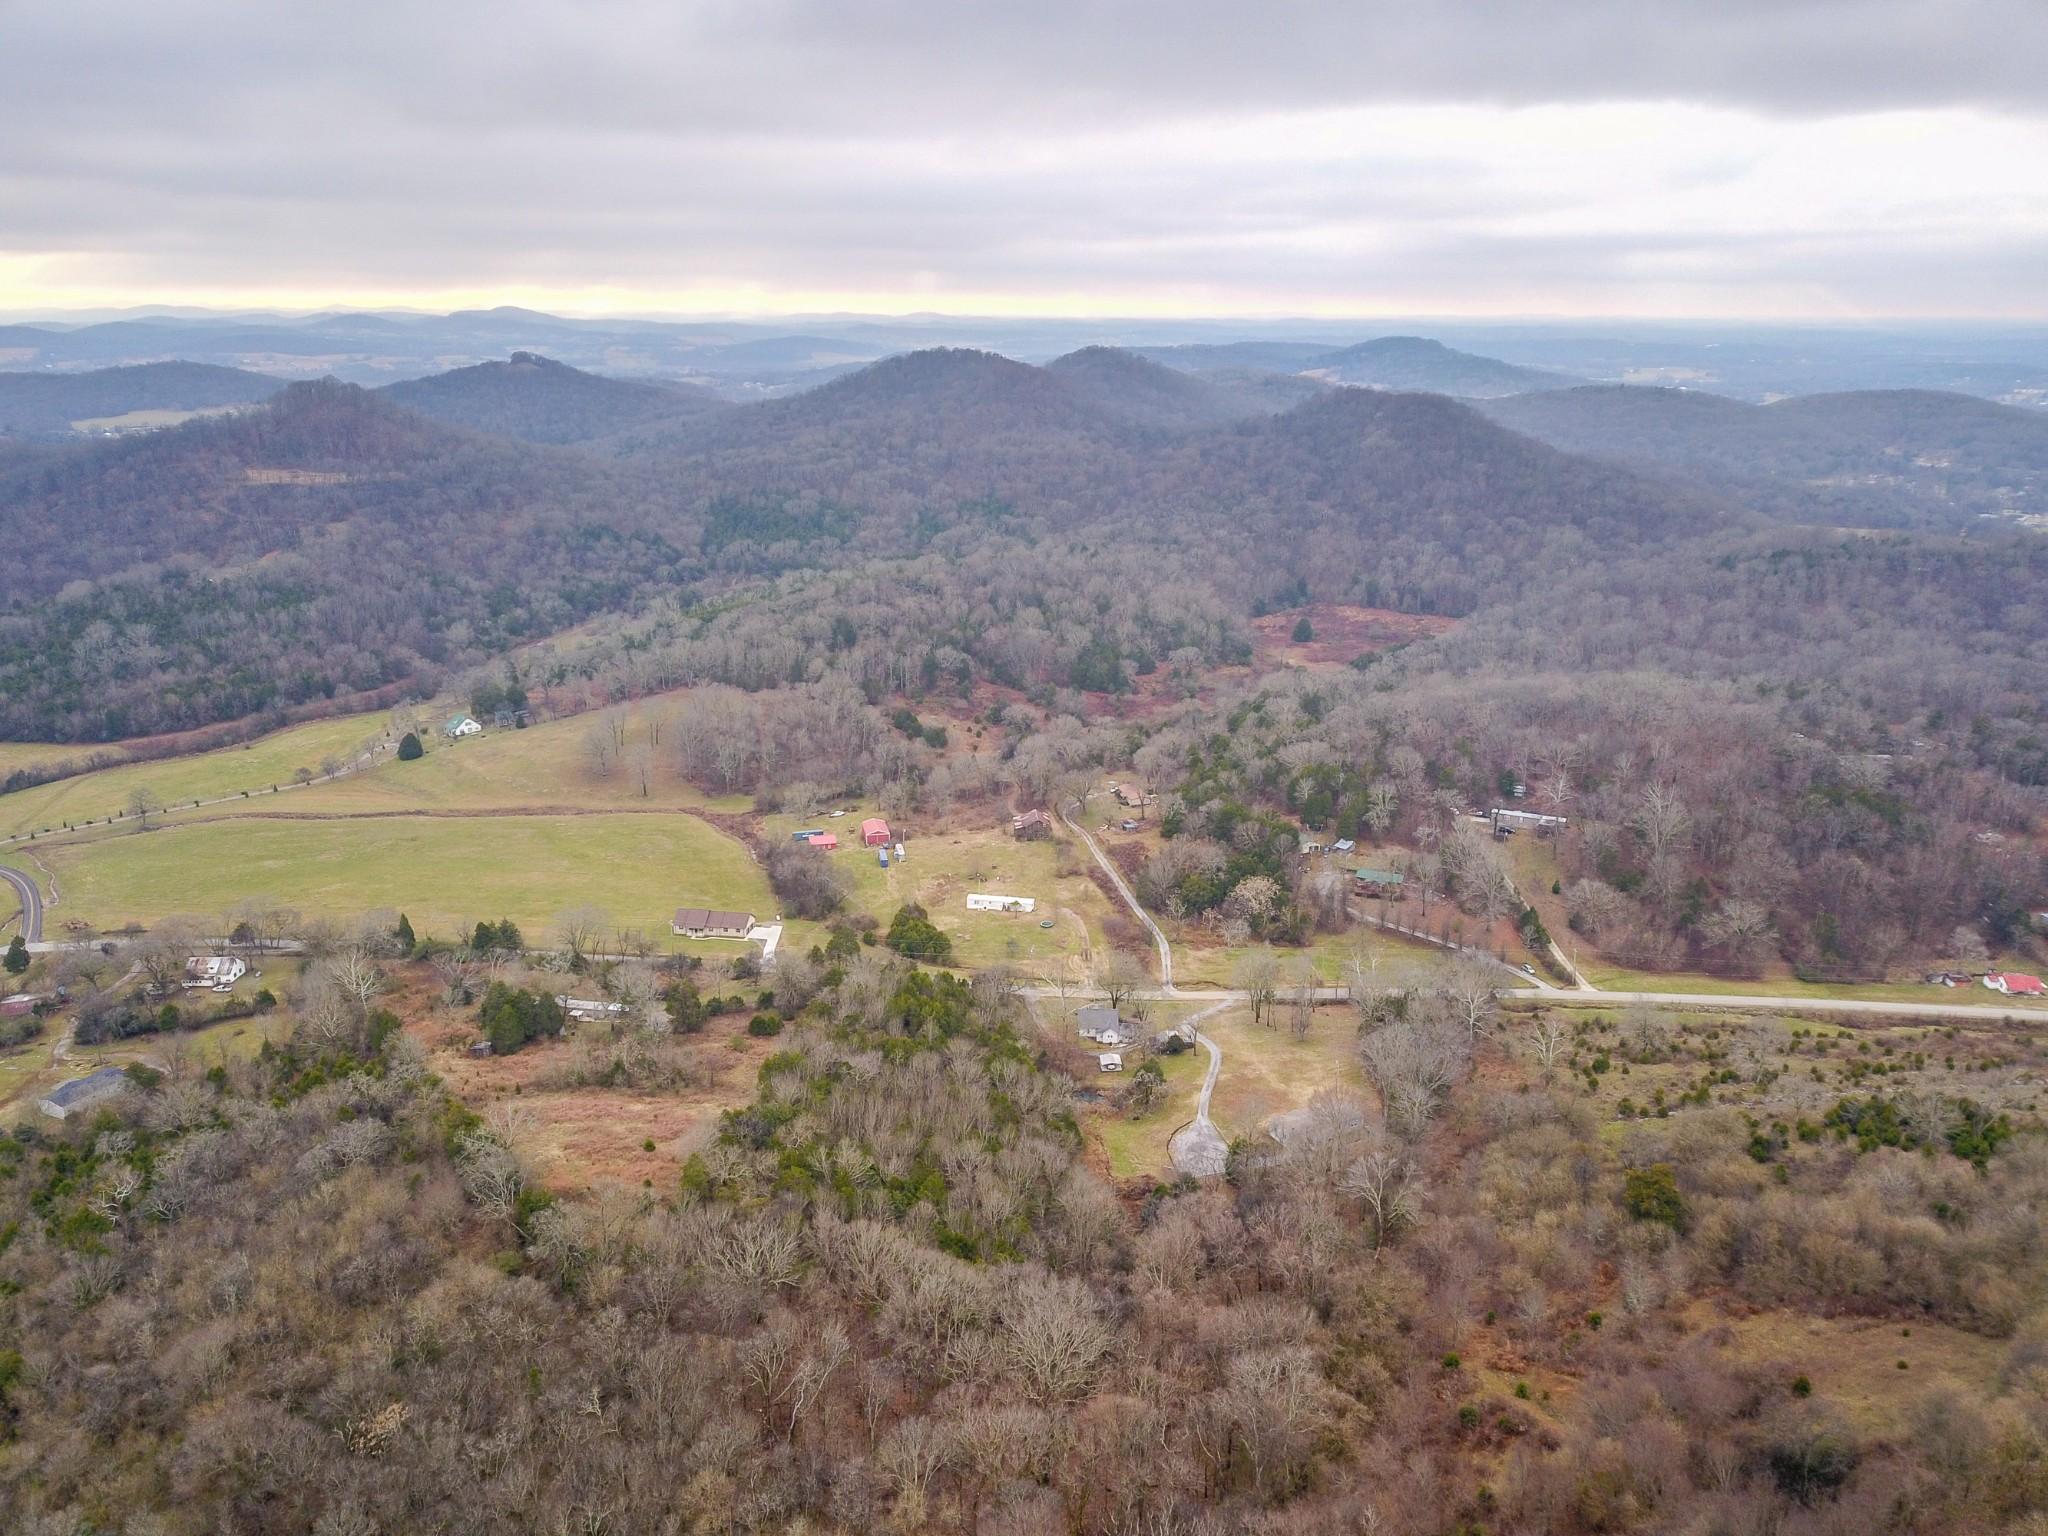 1875 Fort Blount Rd, Hartsville, TN 37074 - Hartsville, TN real estate listing